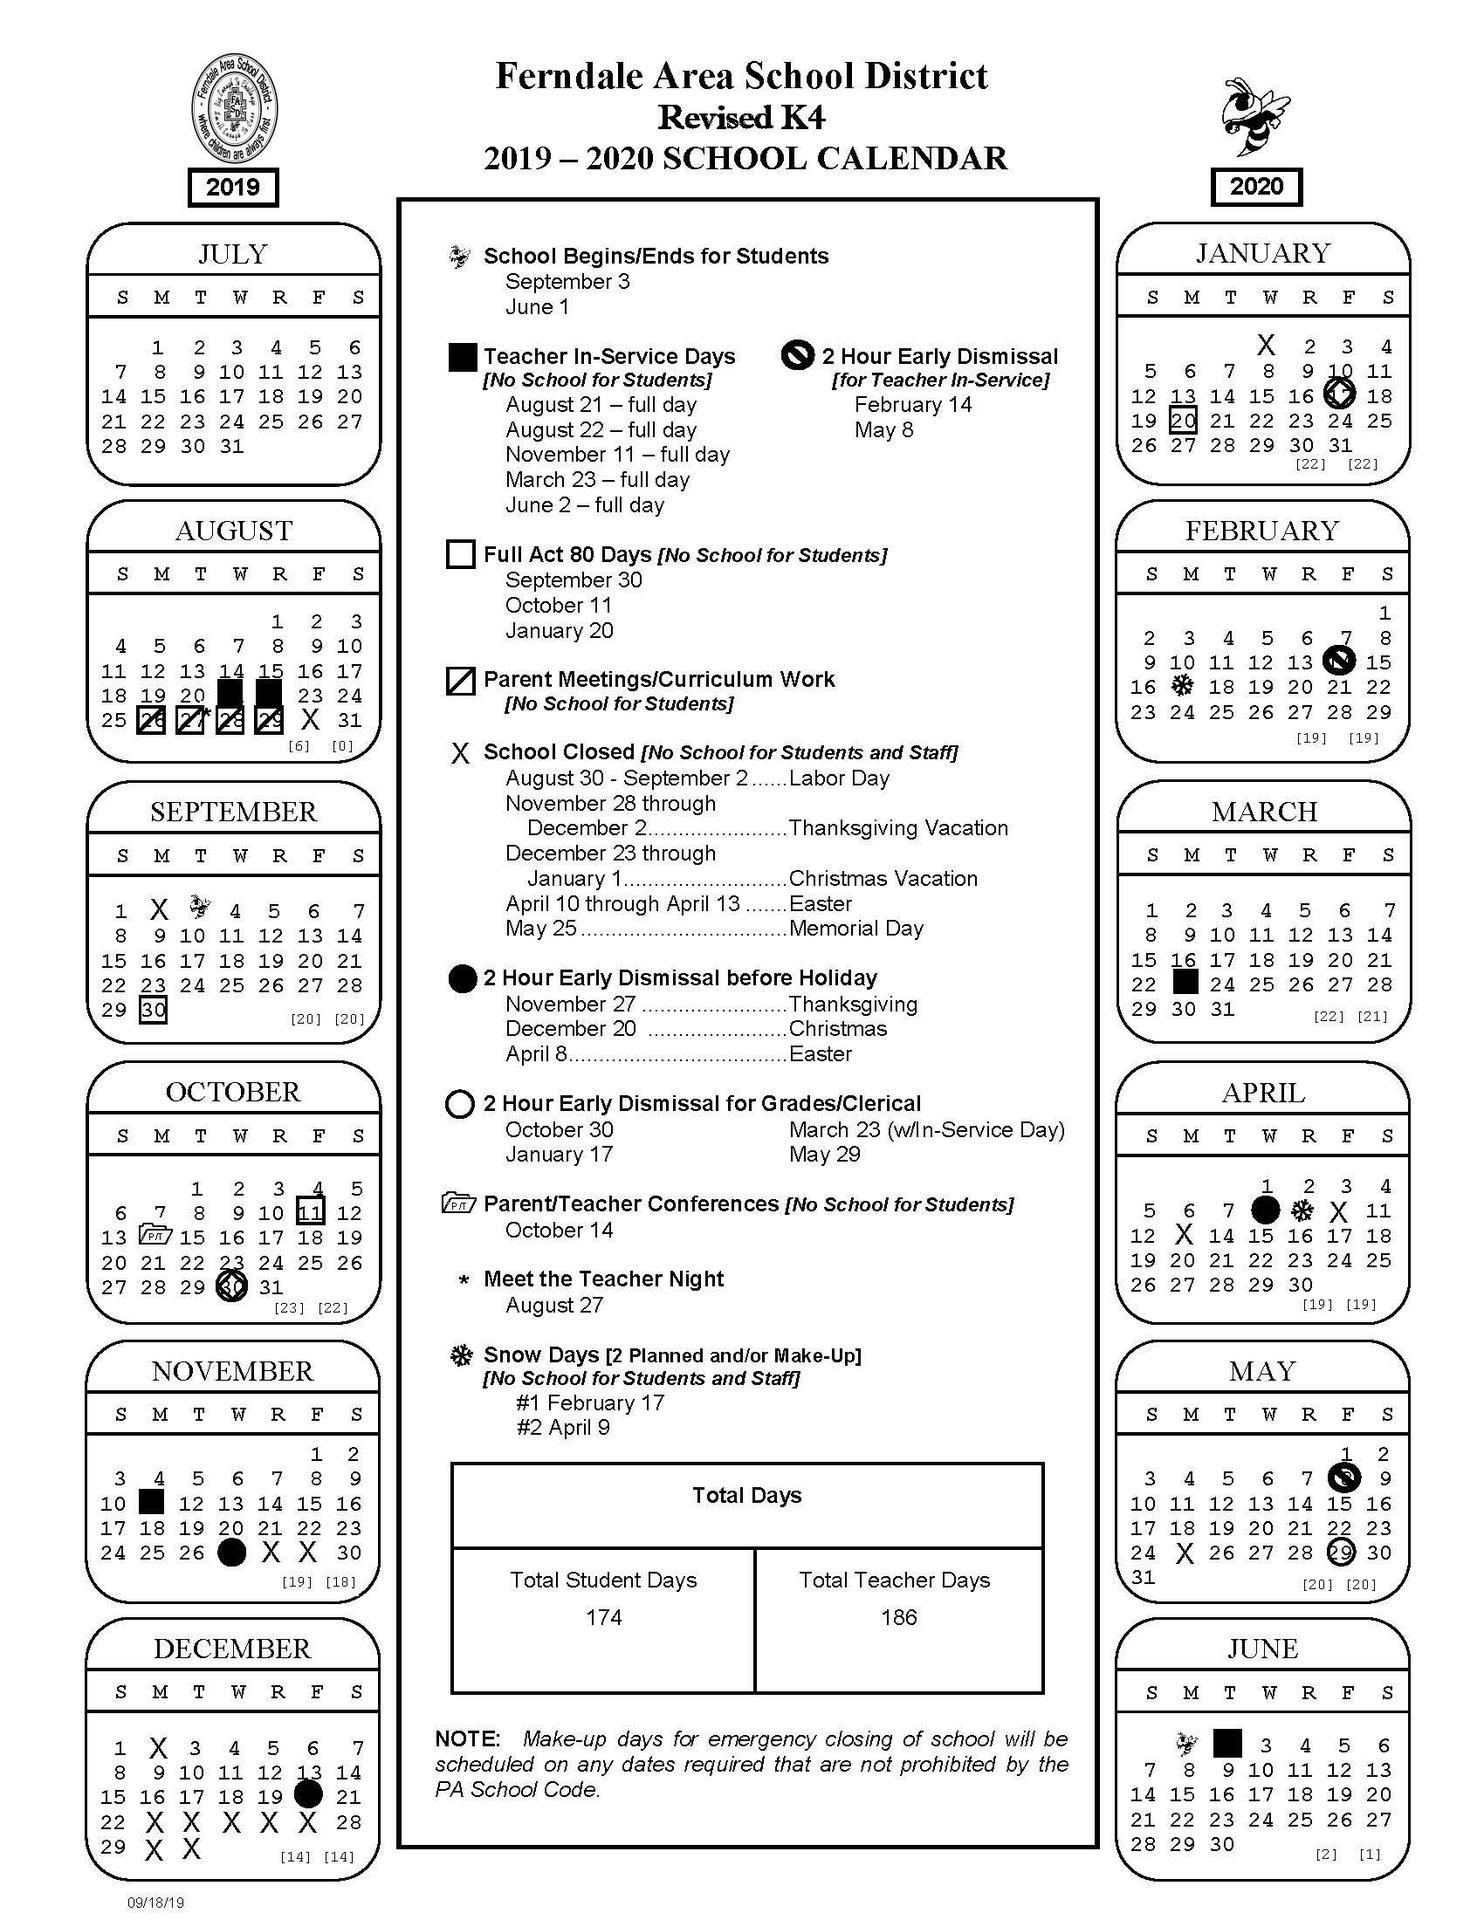 2019 -2020 Revised K4 School Calendar